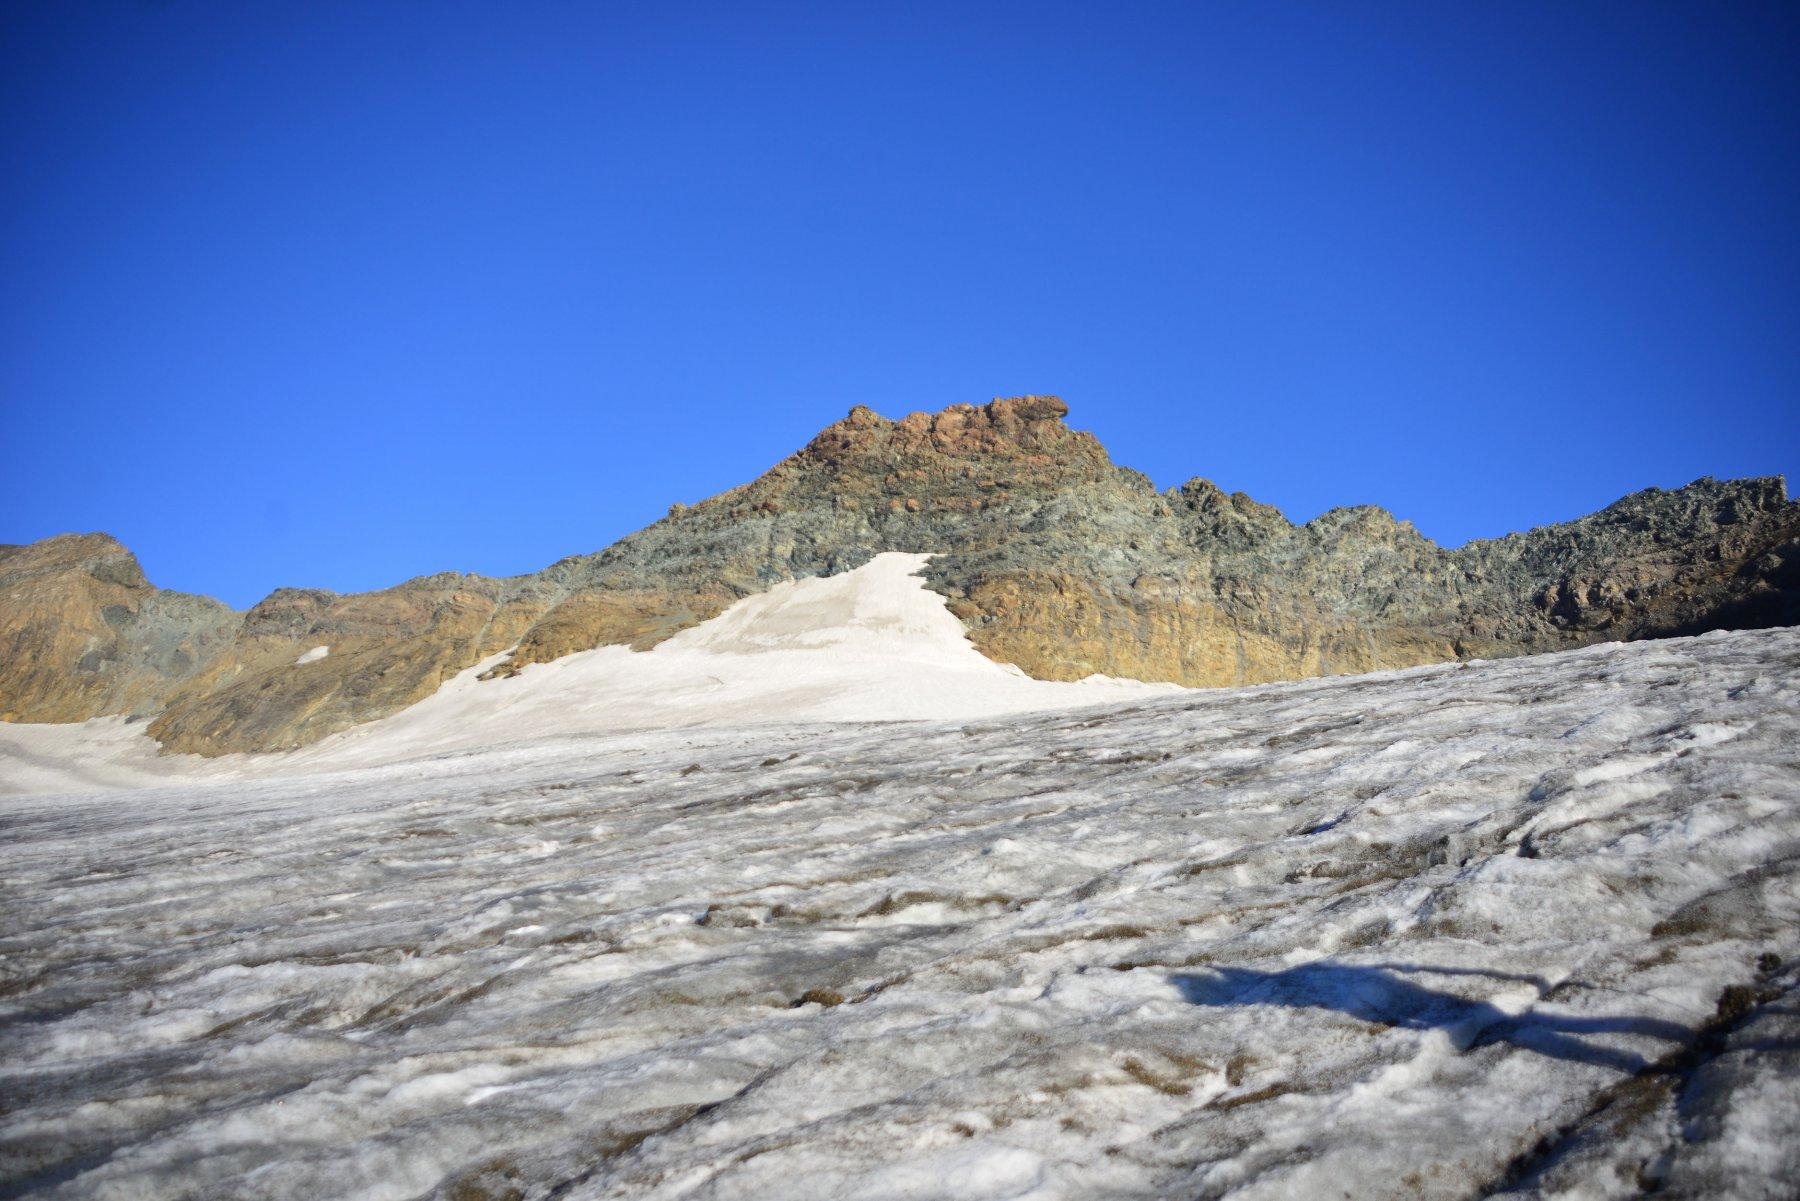 sopra il ghiacciaio